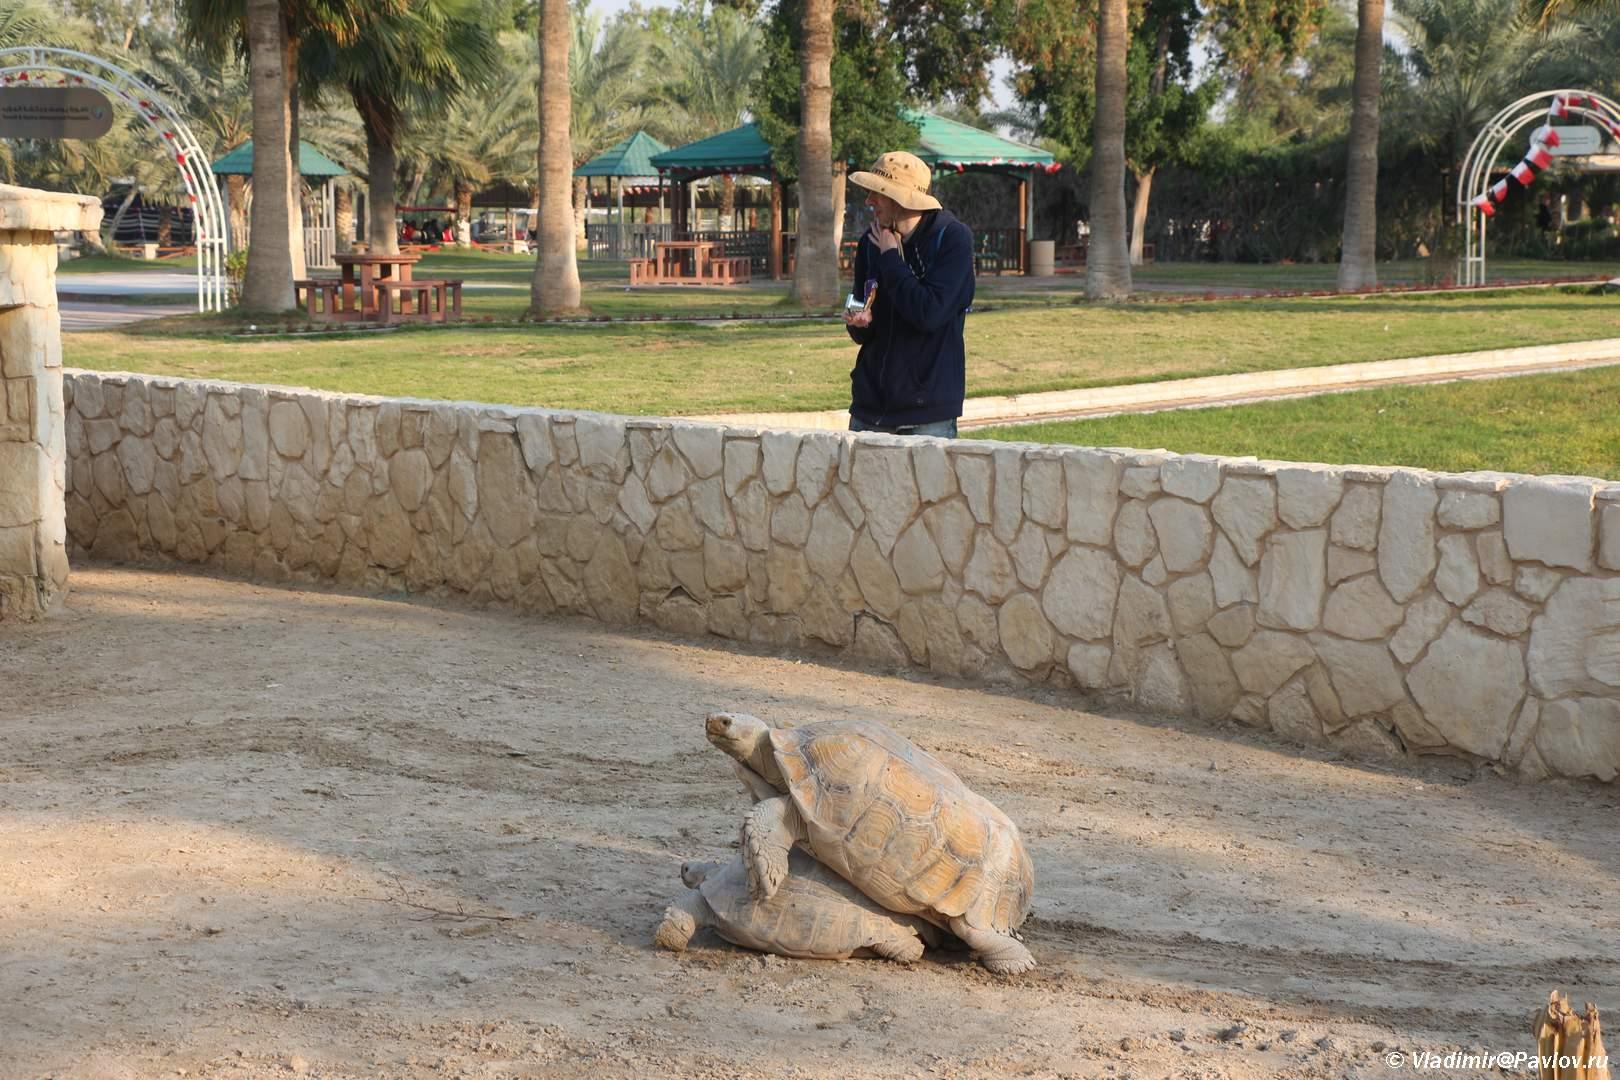 Redkij kadr cherepahi smushhayut Piterskuyu intelligentsiyu. Bahrejn - Парк дикой природы Аль-Арин (Al Areen Wildlife Park) 2. Бахрейнский Зоопарк